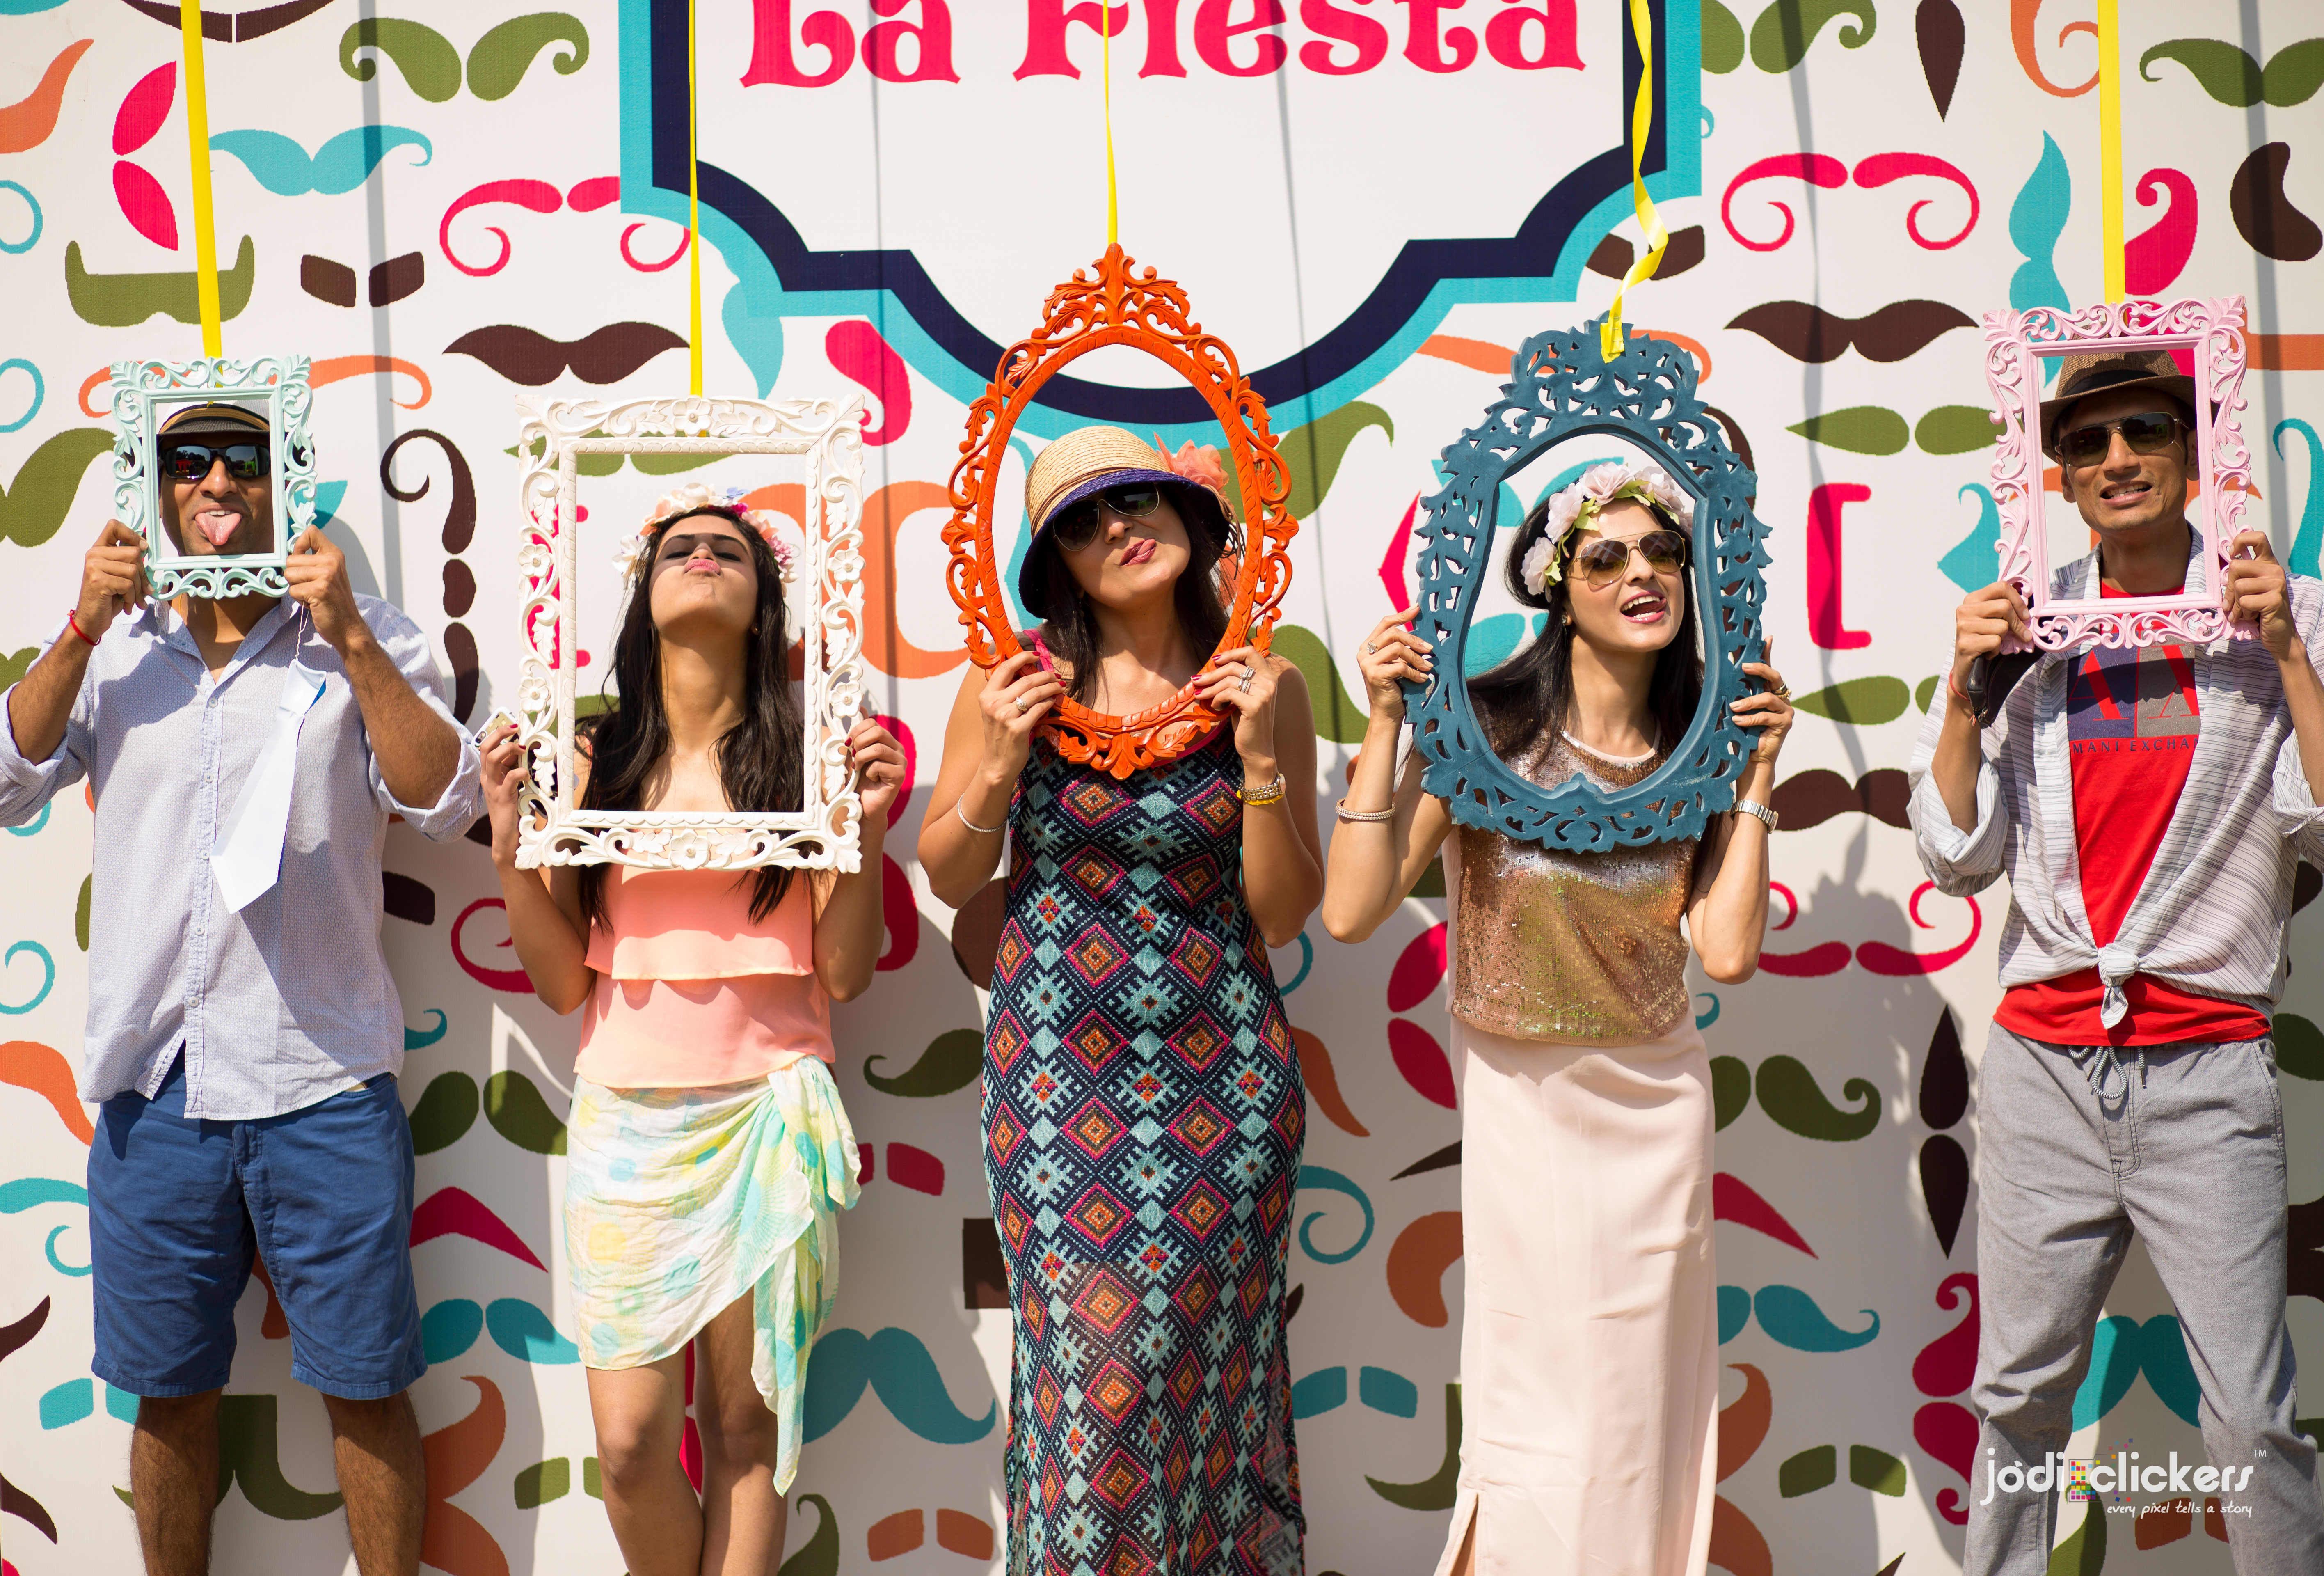 the perfect click!:jodi clickers, f5 advertainment, manish malhotra